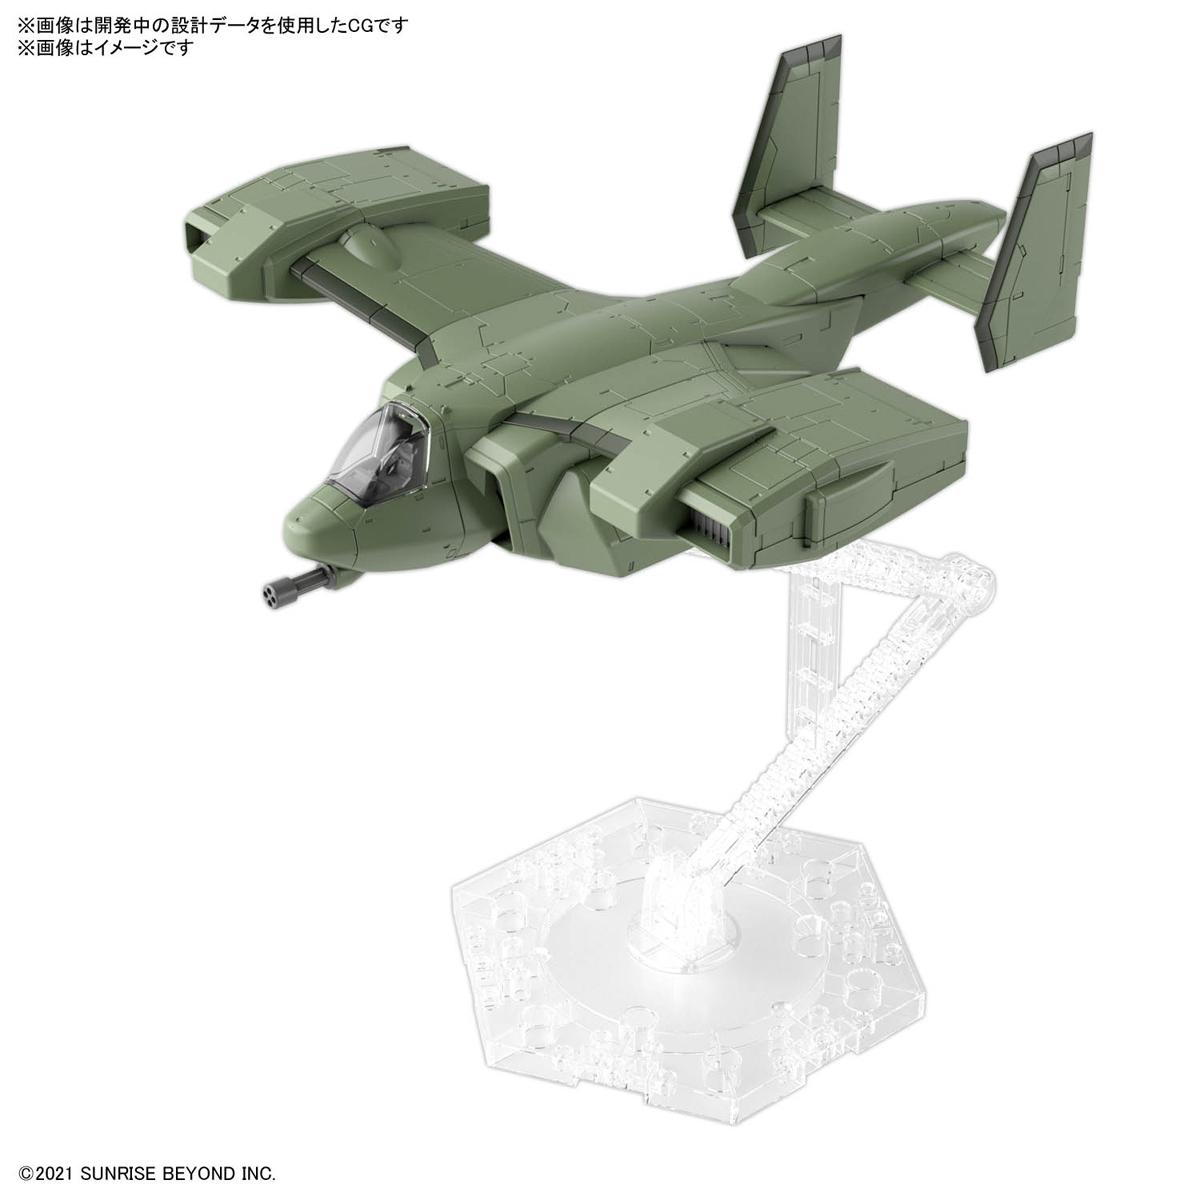 HG 1/72『ブレイディハウンド』境界戦機 プラモデル-007